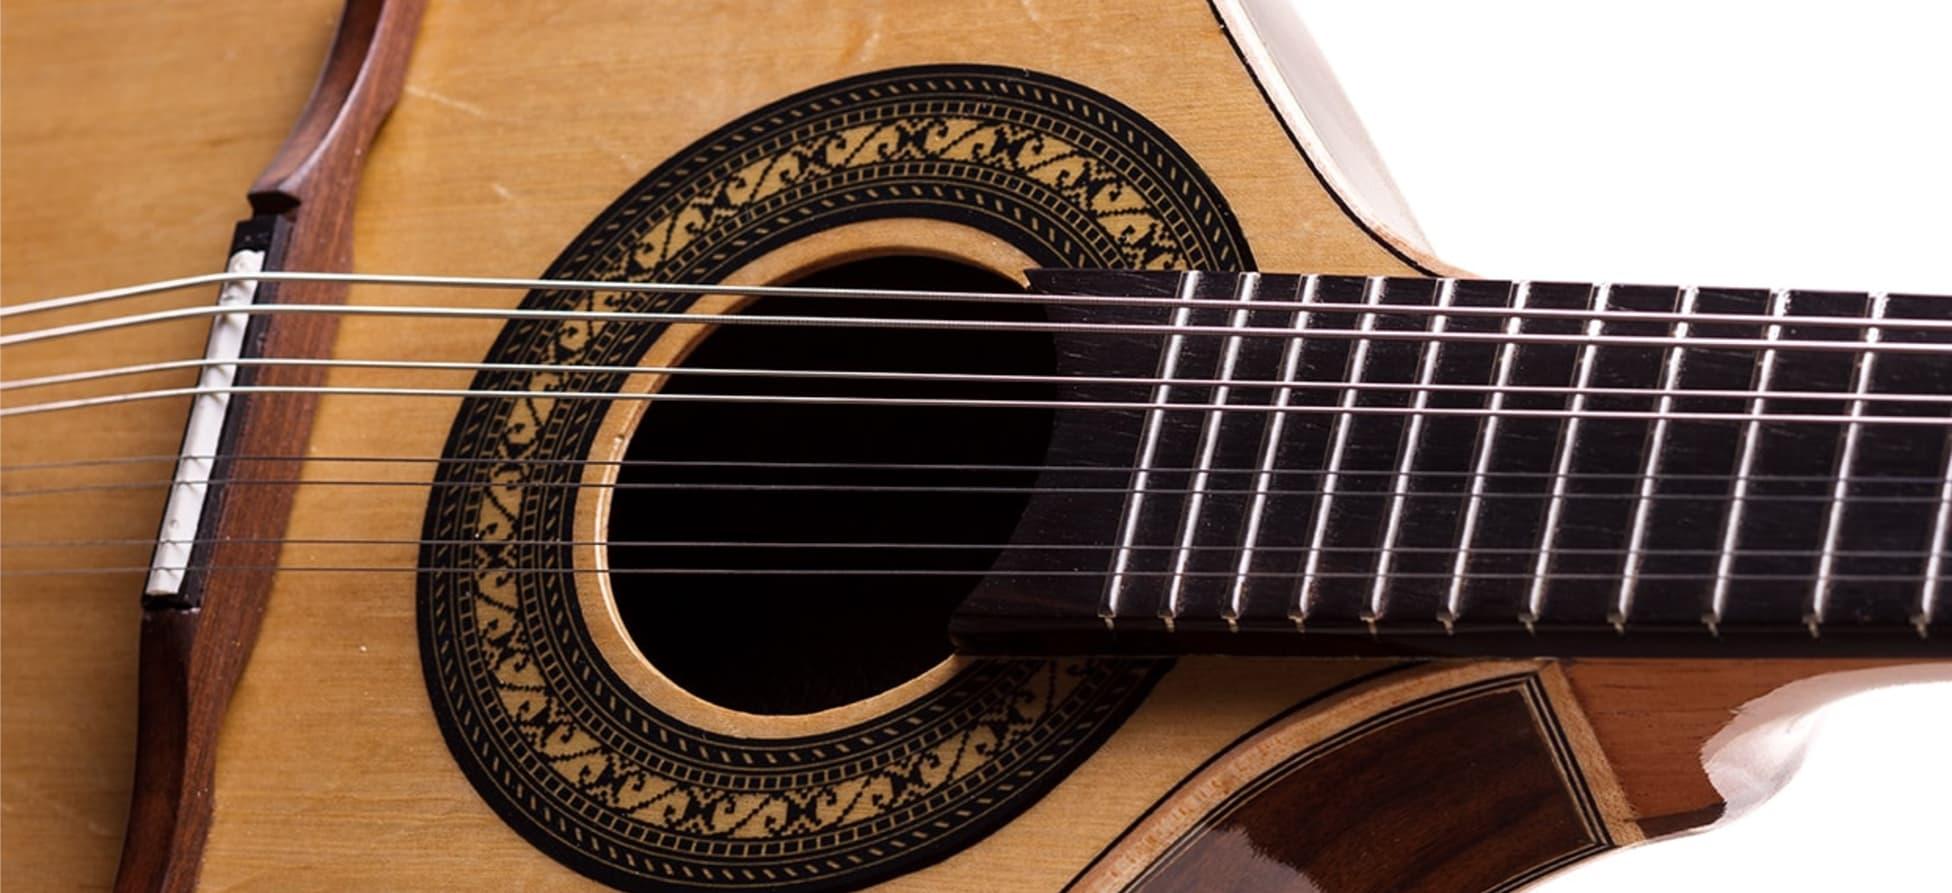 BANDOLIM STUDIO ELÉTRICO | RB21.EL.N.I - Bandolins Elétricos | Rozini Instrumentos Musicais | 100% Brasileira